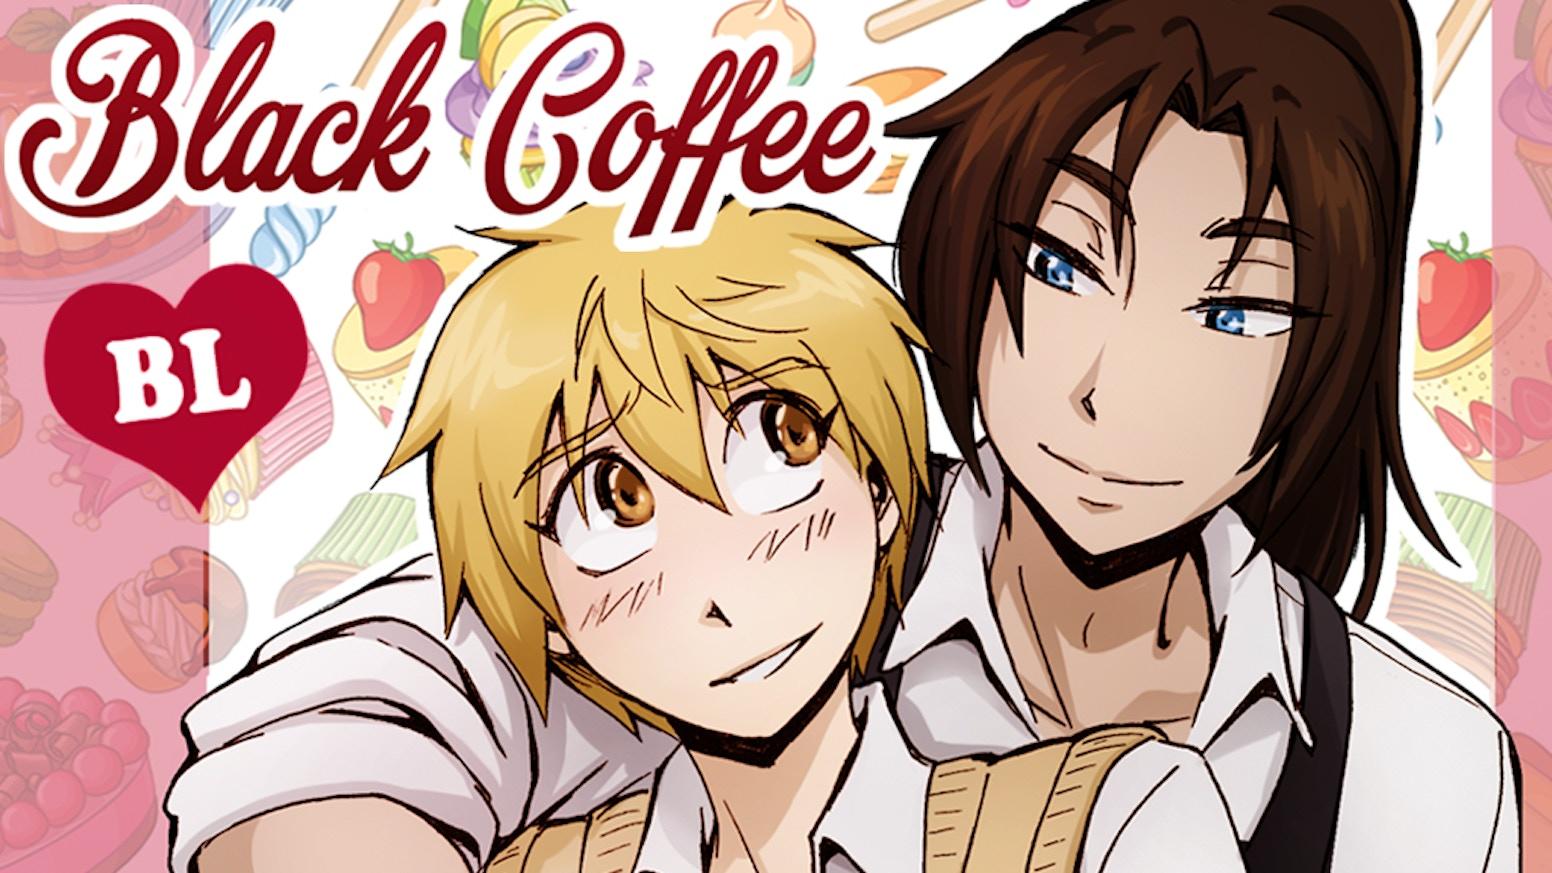 Bl Manga Publication Black Coffee Yaoi Shounen Ai Comic By Sparkly Comics Kickstarter